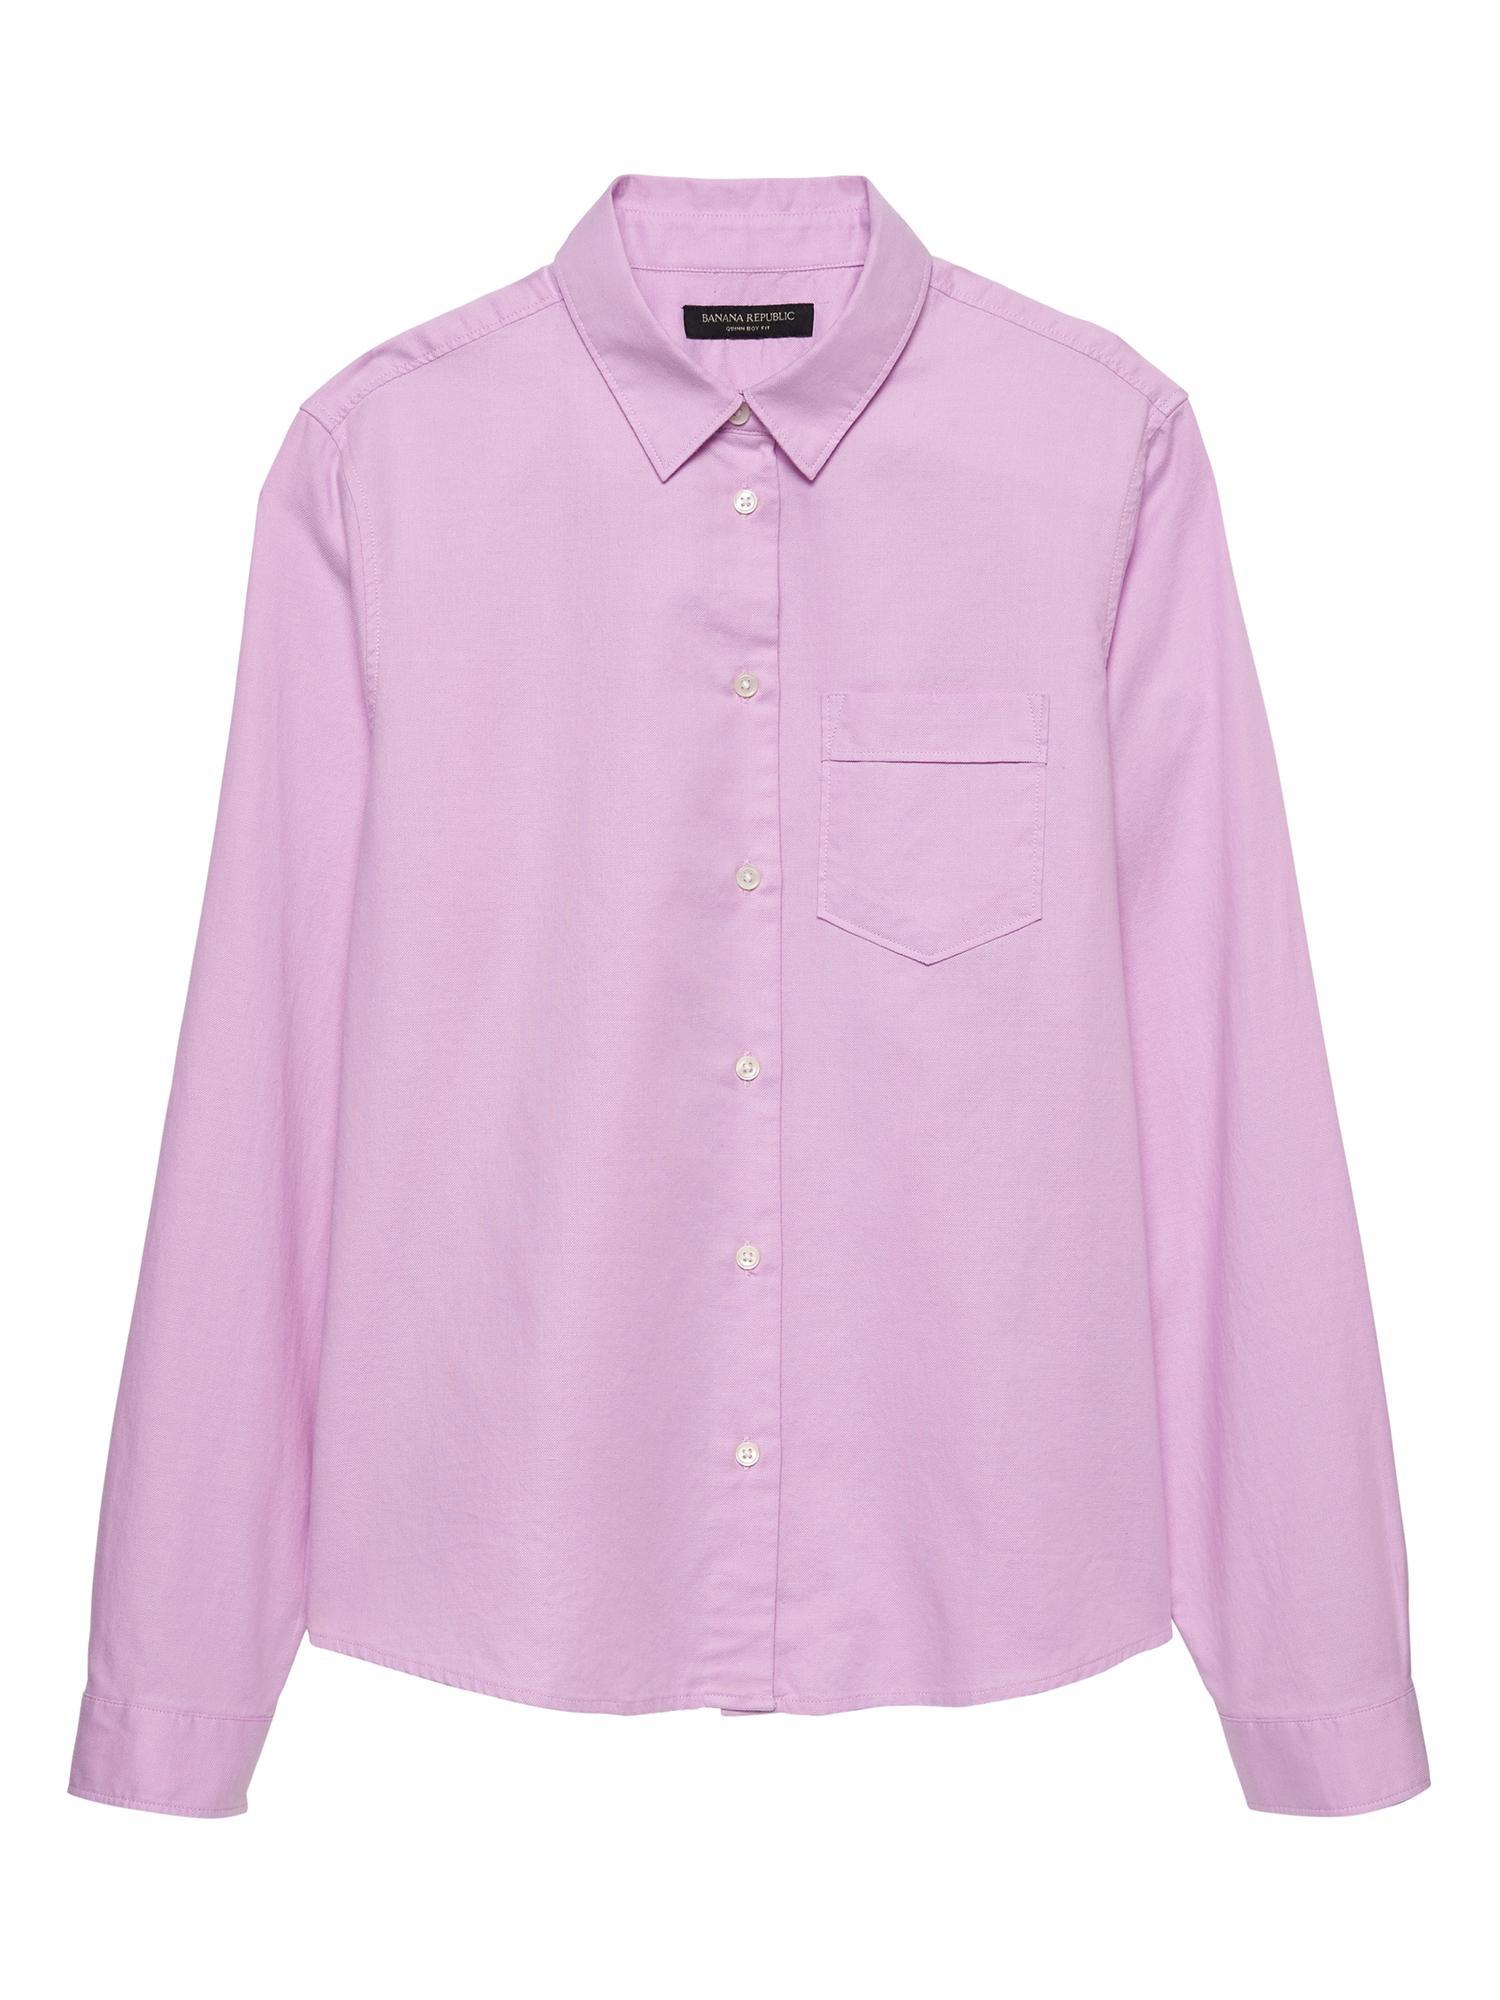 Lyst Banana Republic Petite Quinn Boy Fit Oxford Shirt In Pink For Men